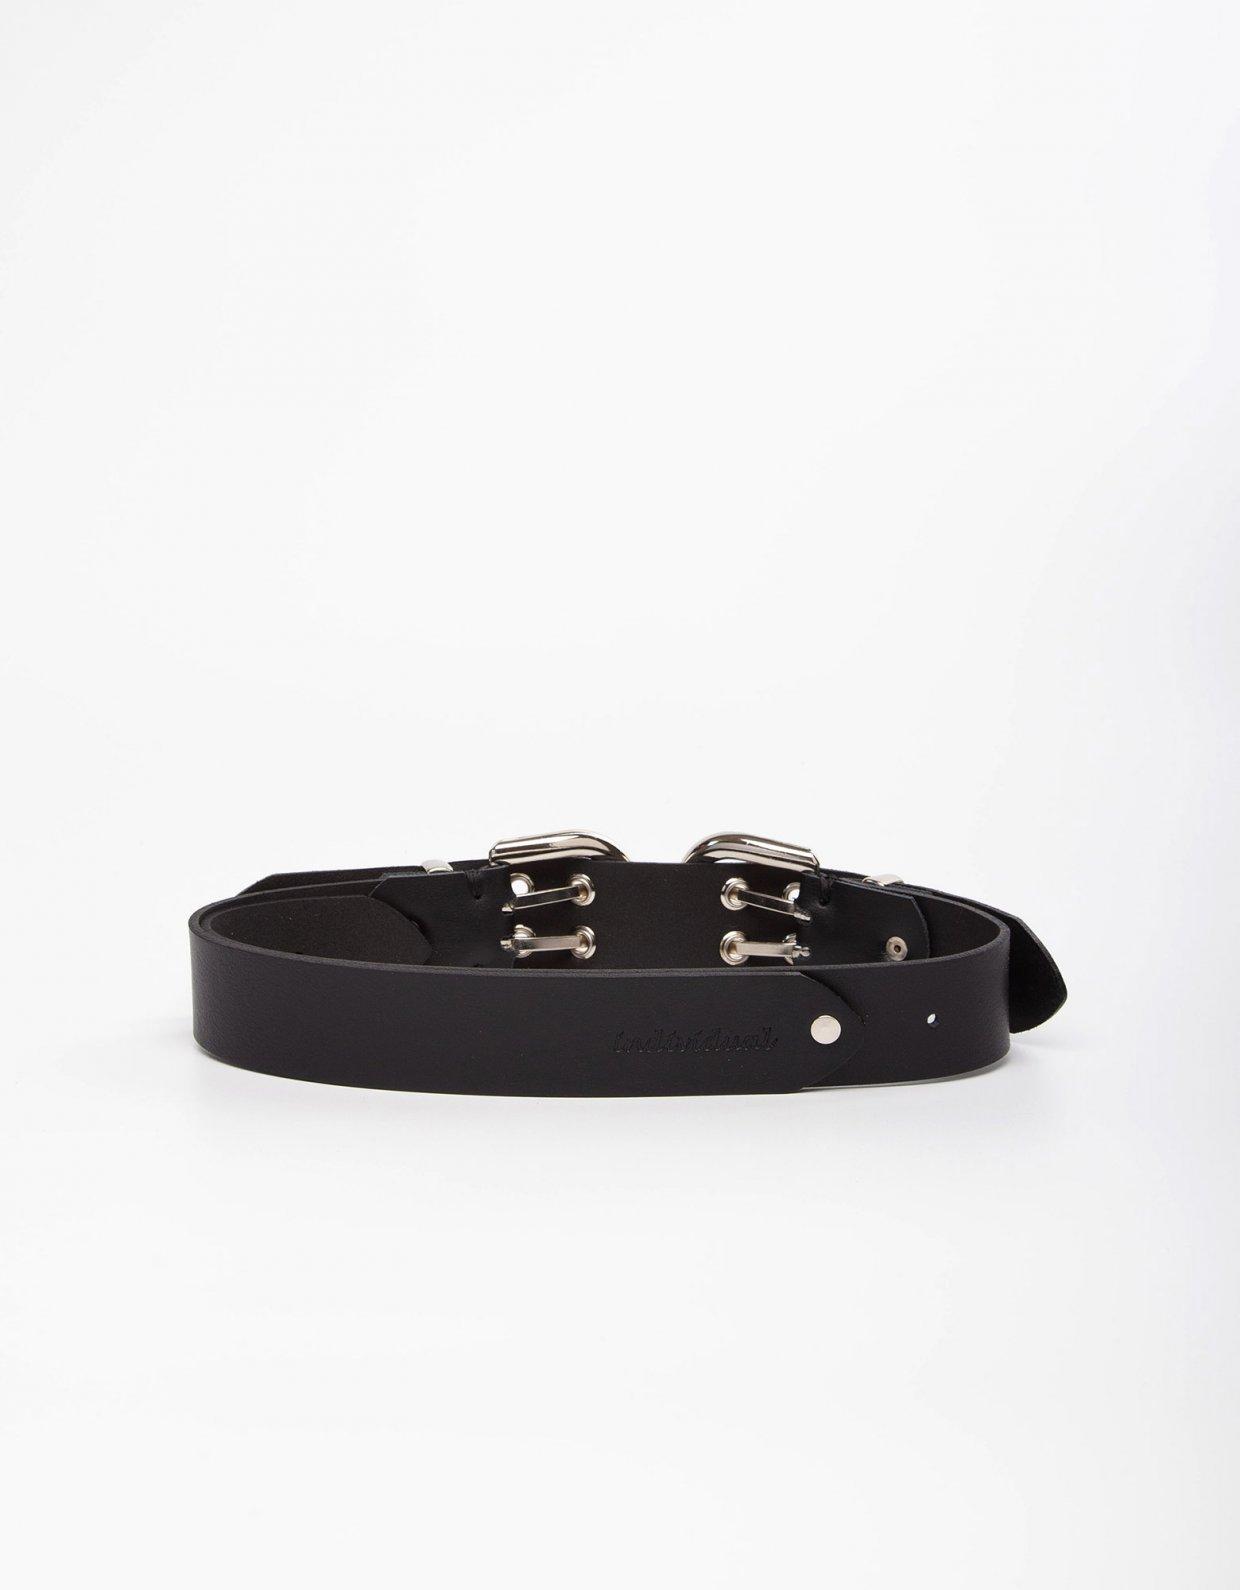 Individual Art Leather Calma black belt